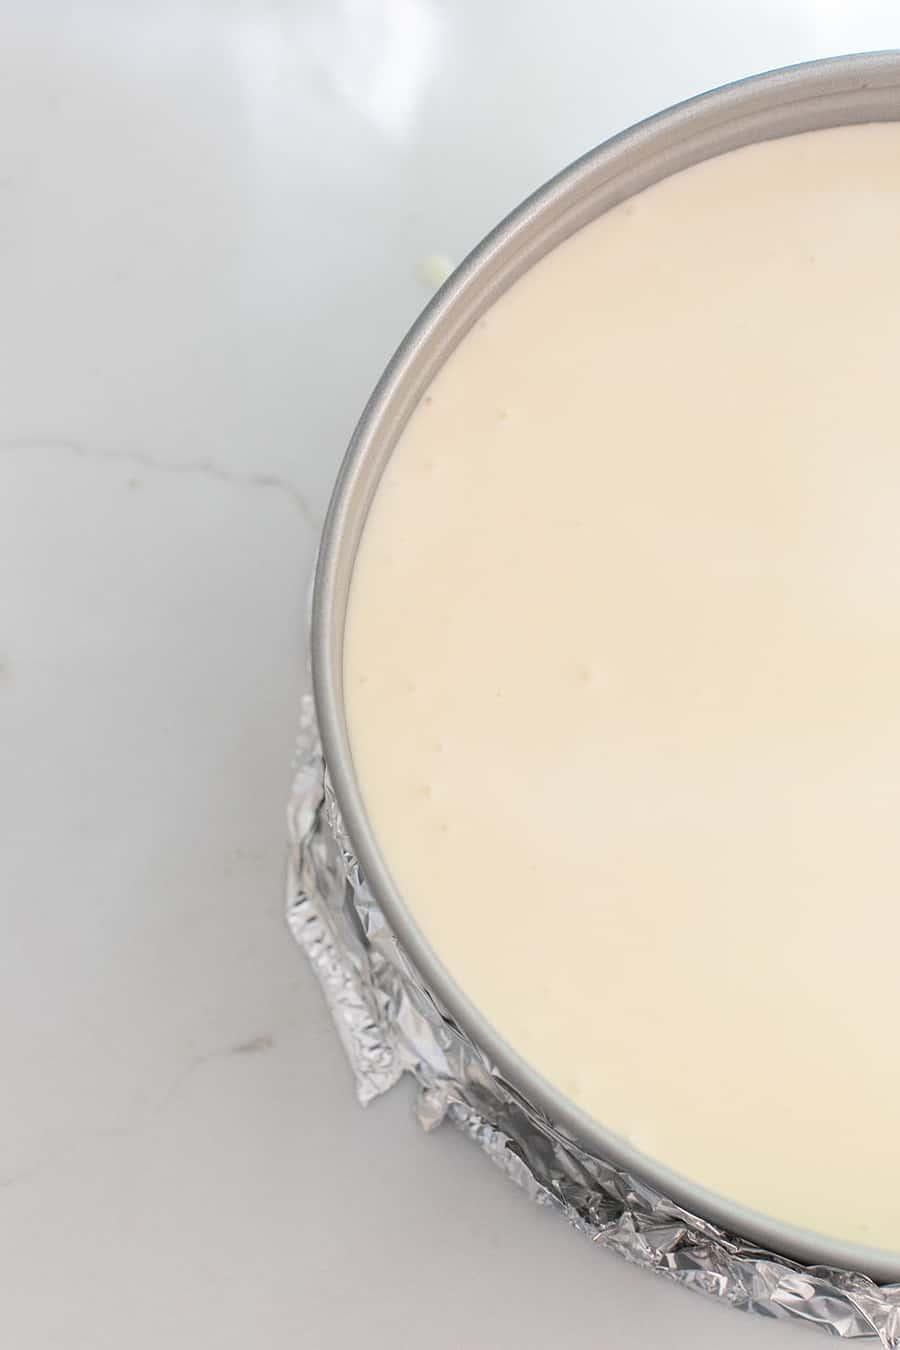 Cheesecake batter in springform pan